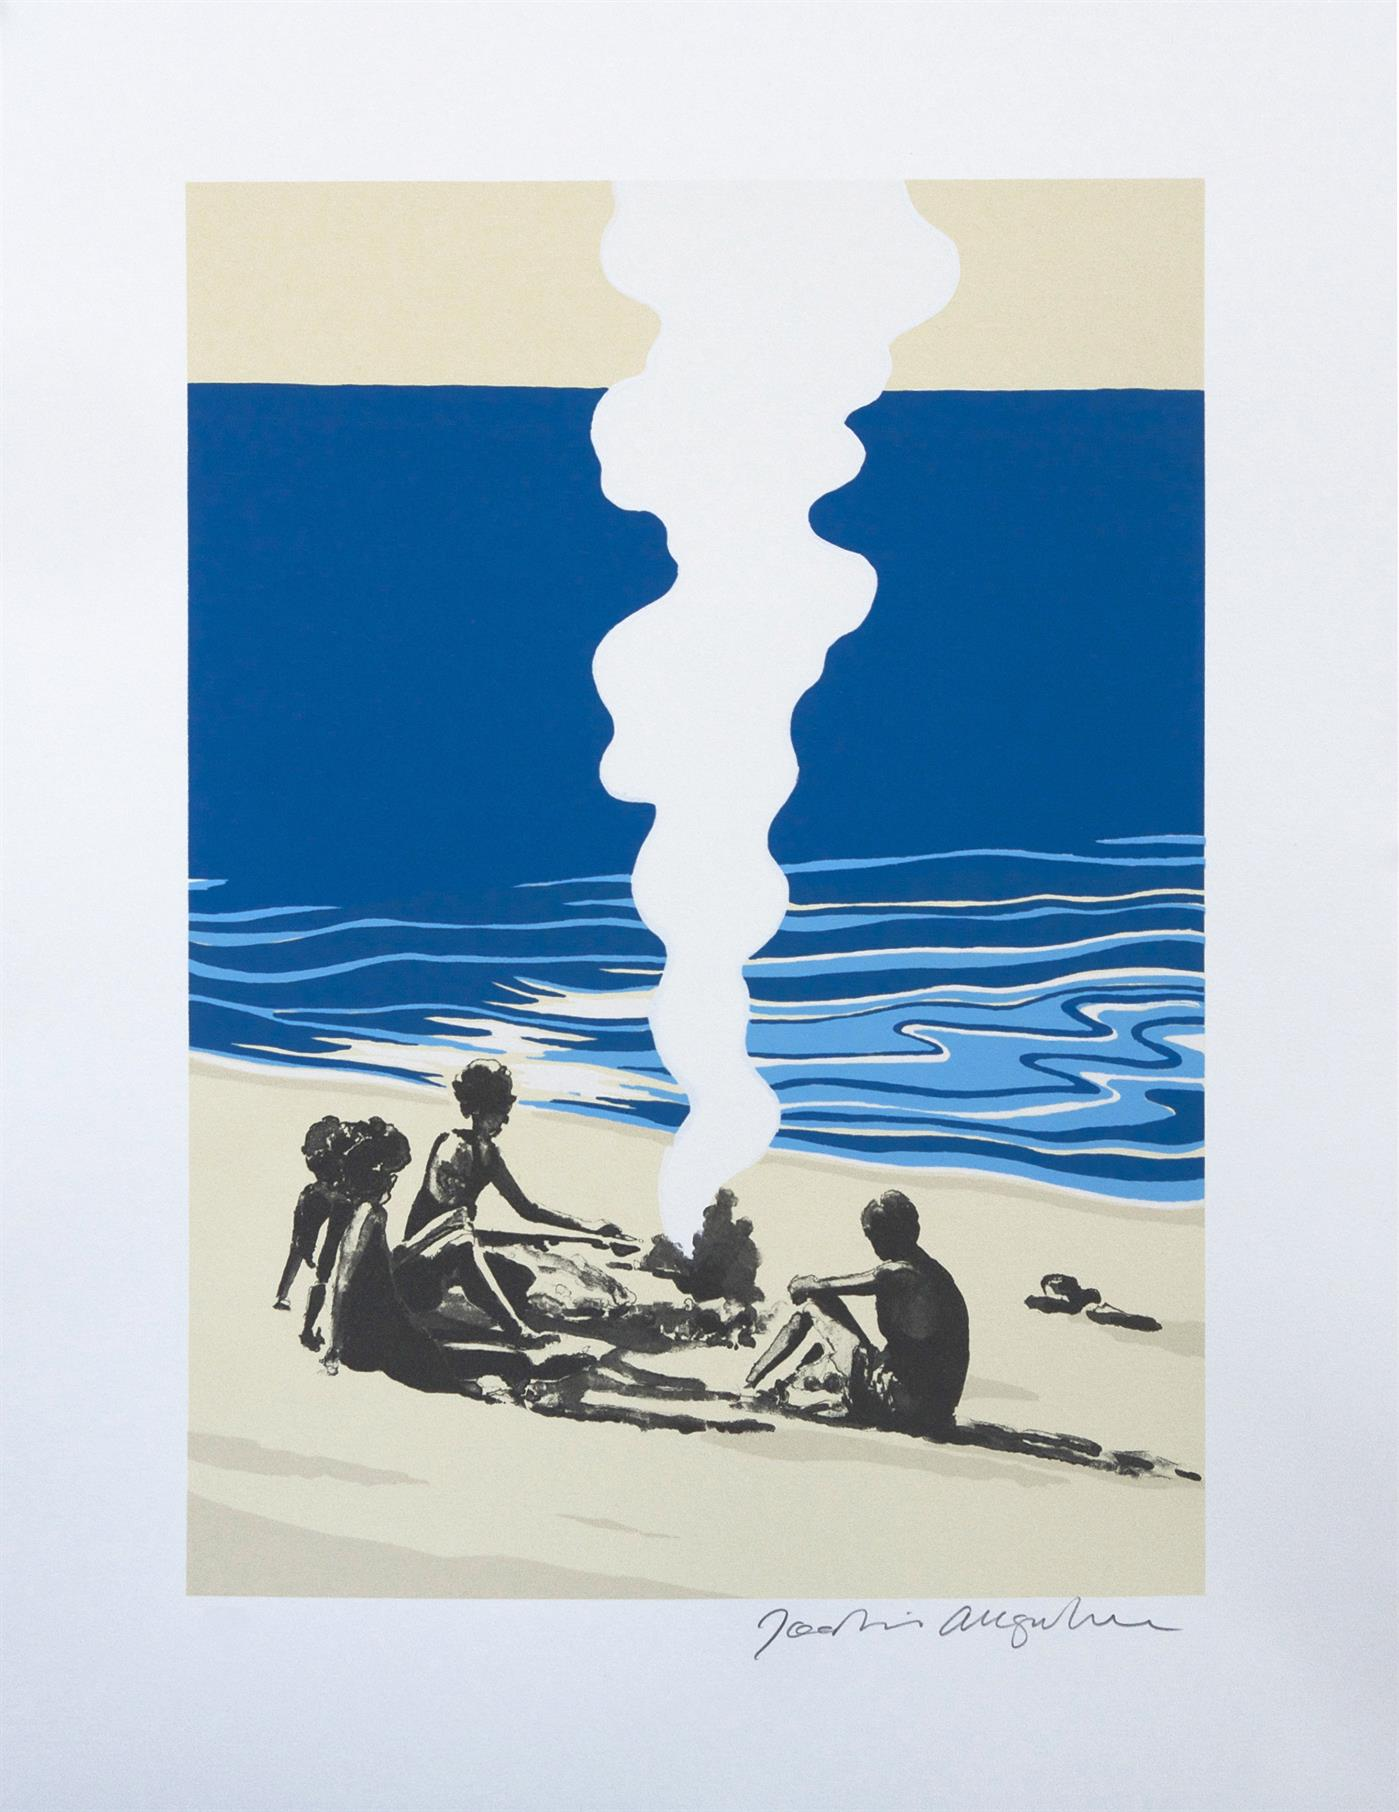 Joakim Allgulander - Stranded, colour lithograph